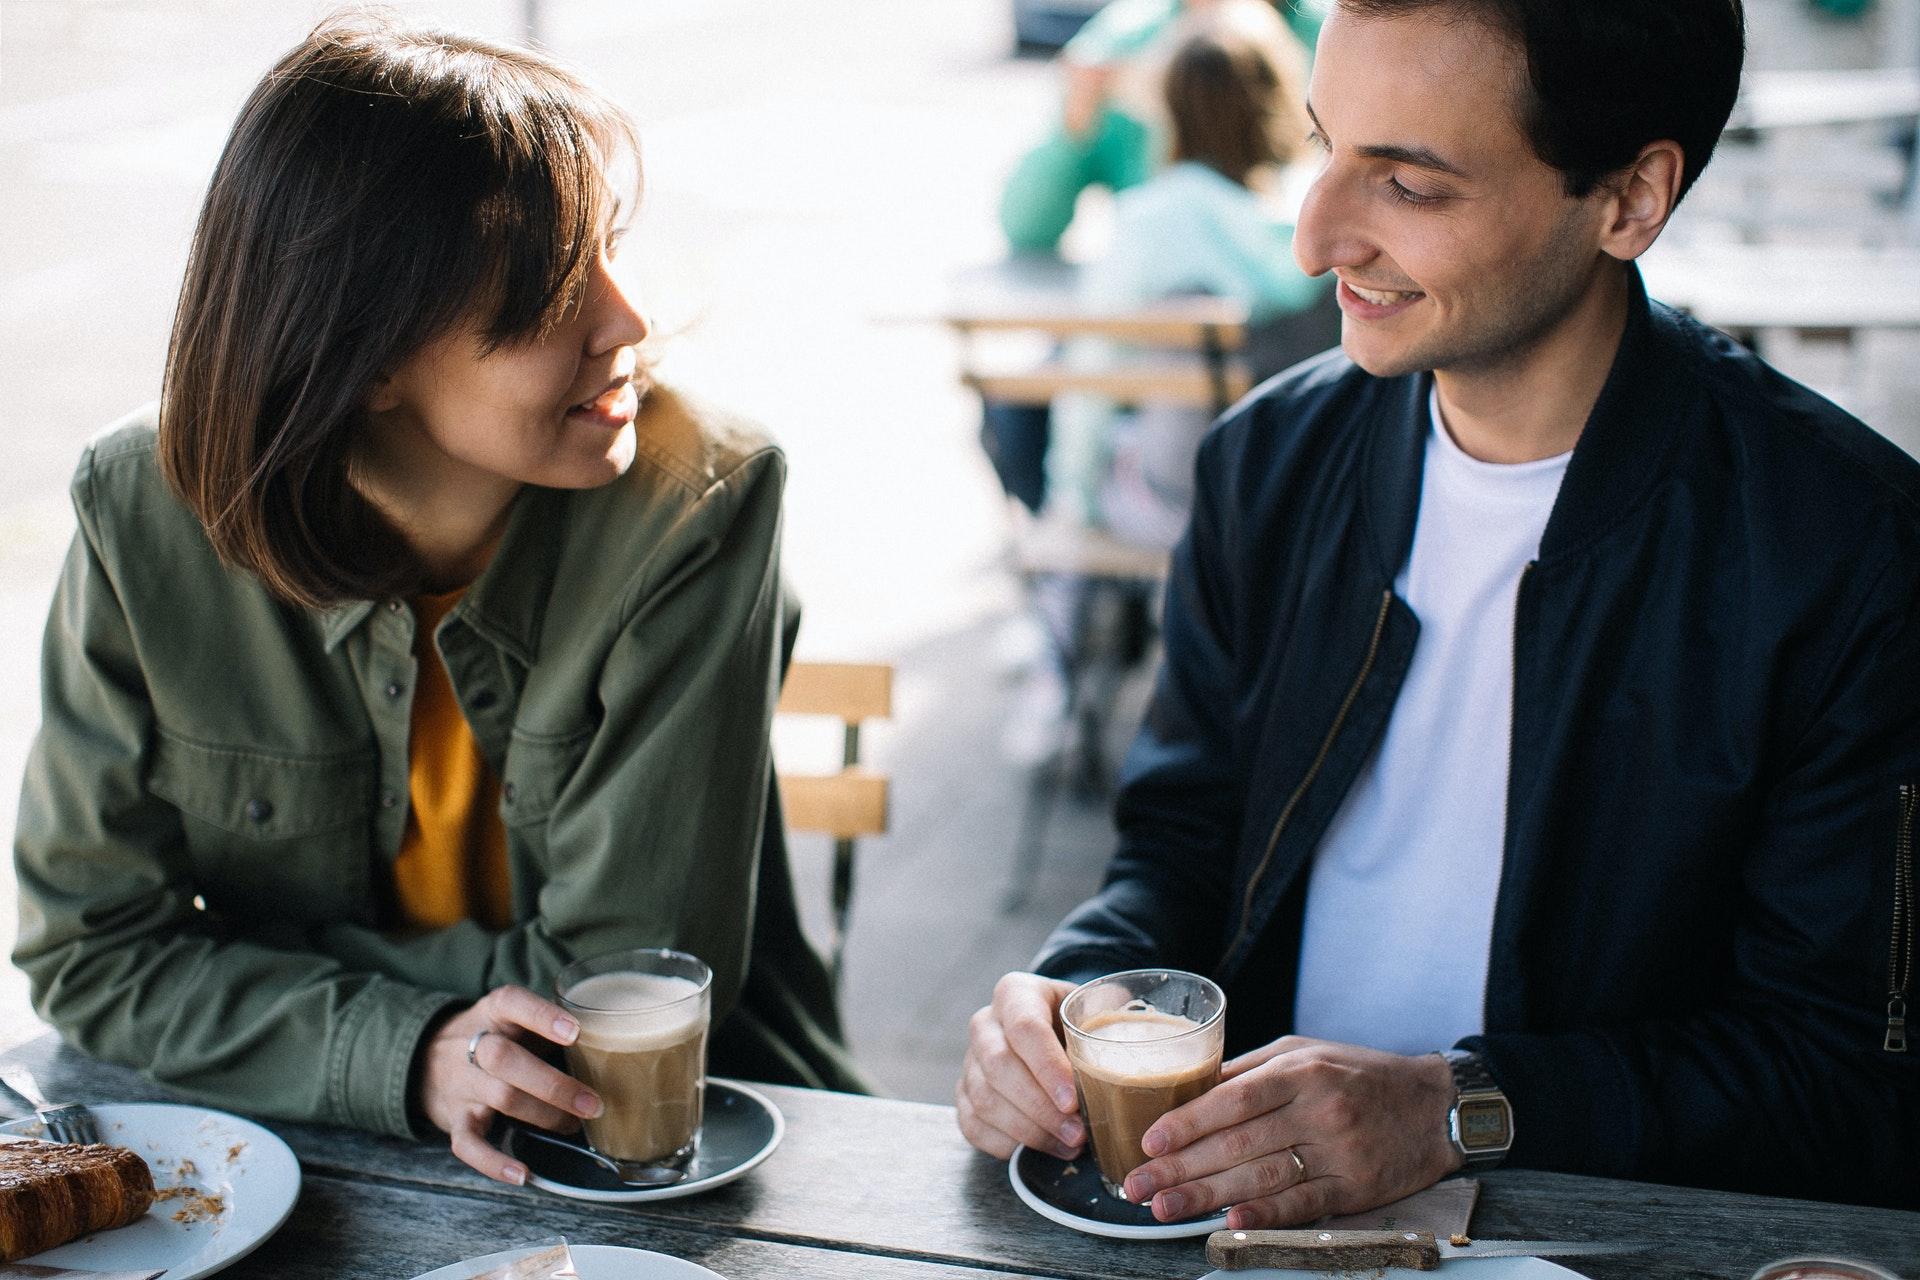 Roasted Coffee Stimulates All Human Senses